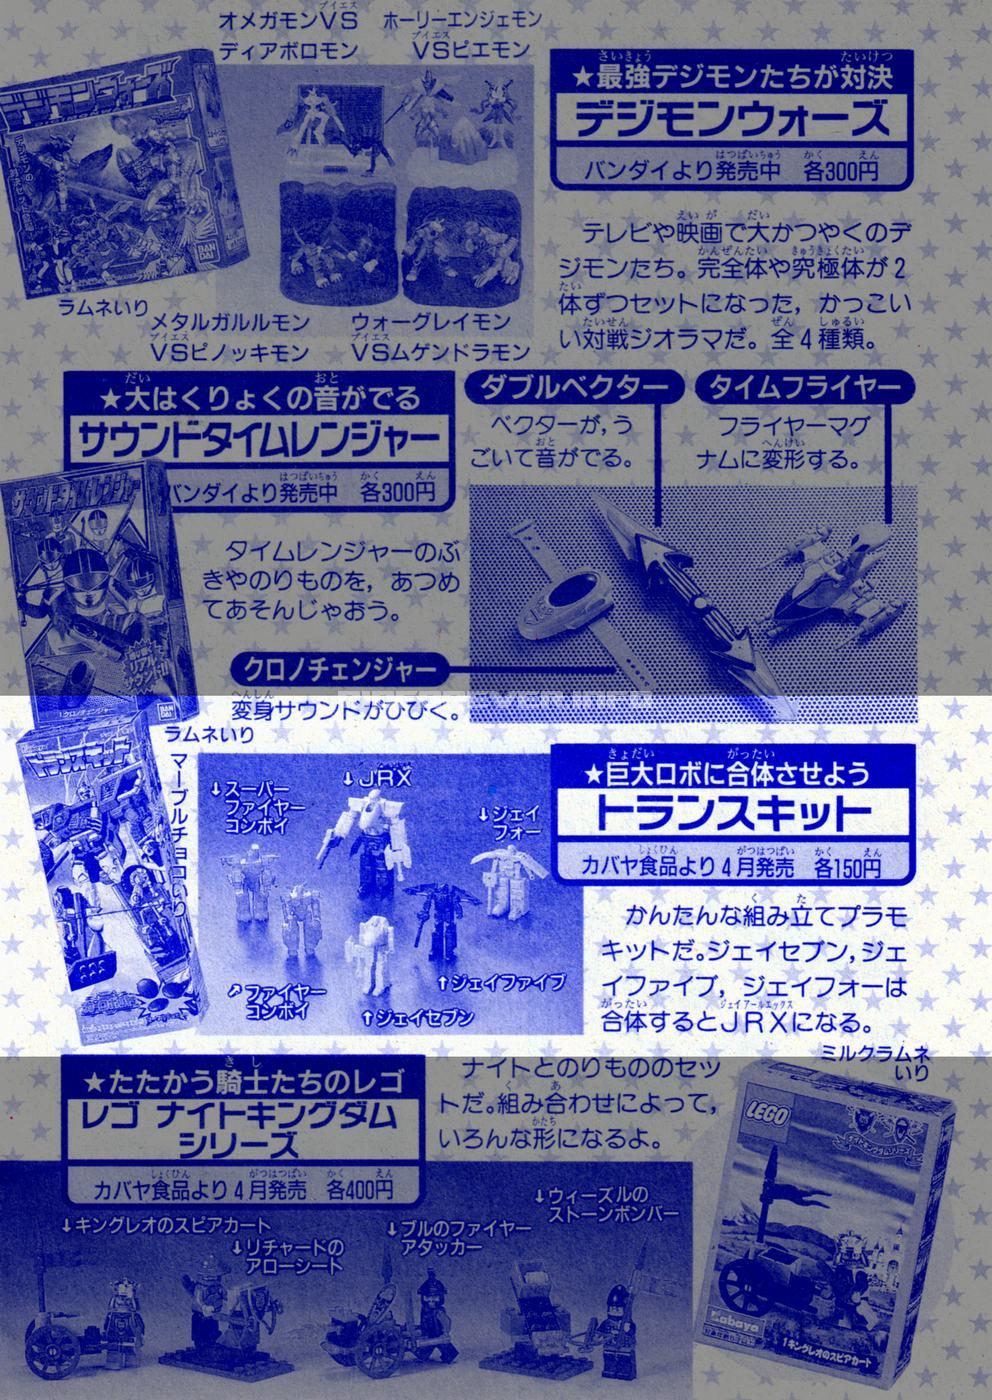 TV Magazine 2000-05-11